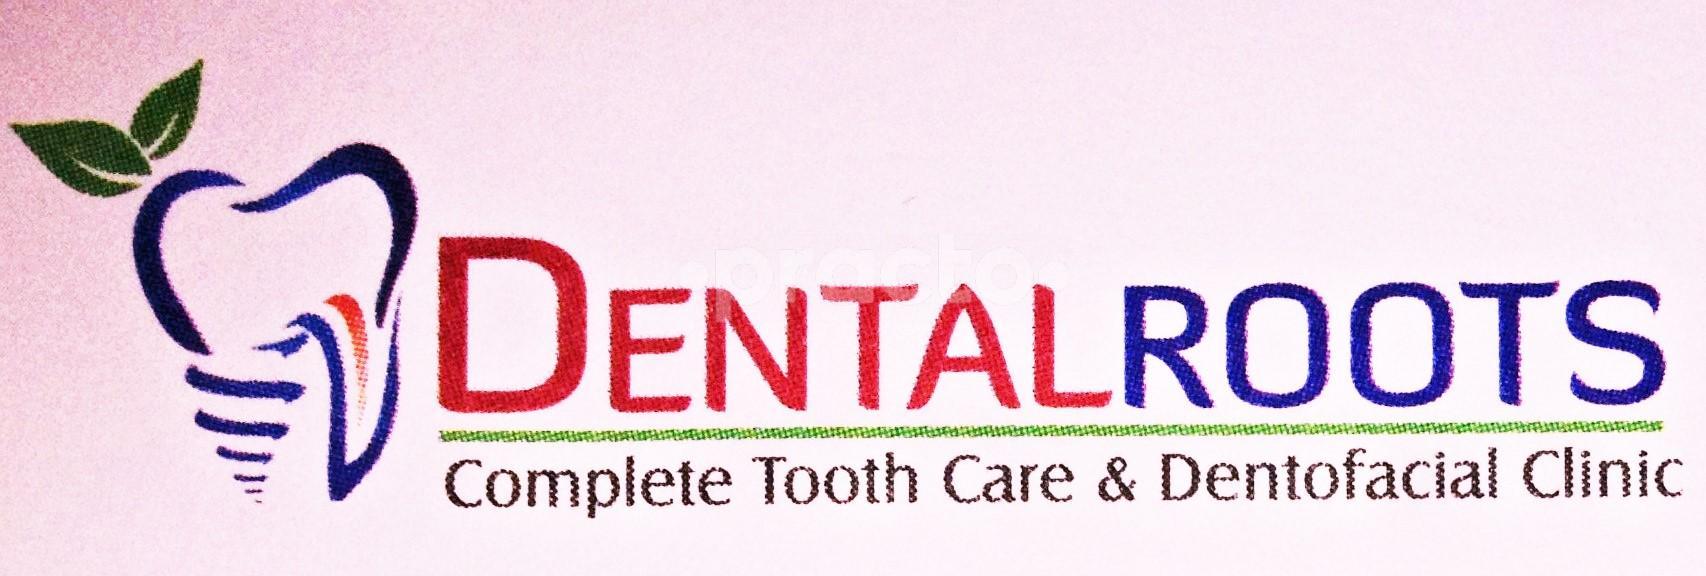 Dental Roots